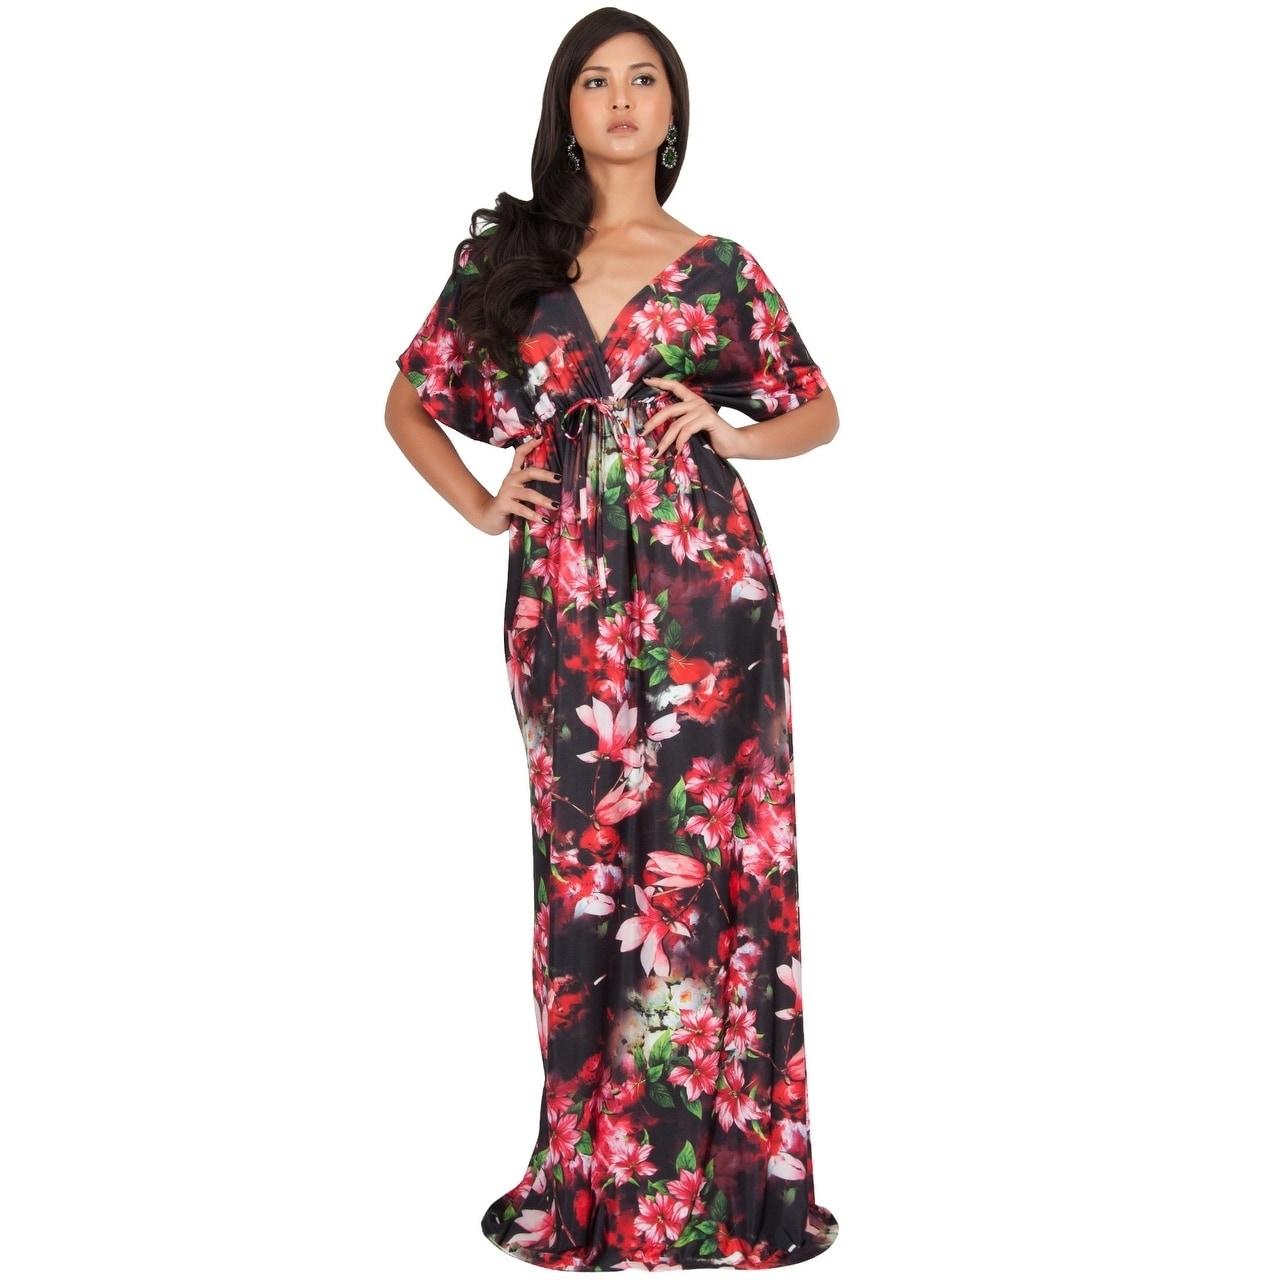 8db85da4aac Floral Print Maxi Dresses With Sleeves - Data Dynamic AG